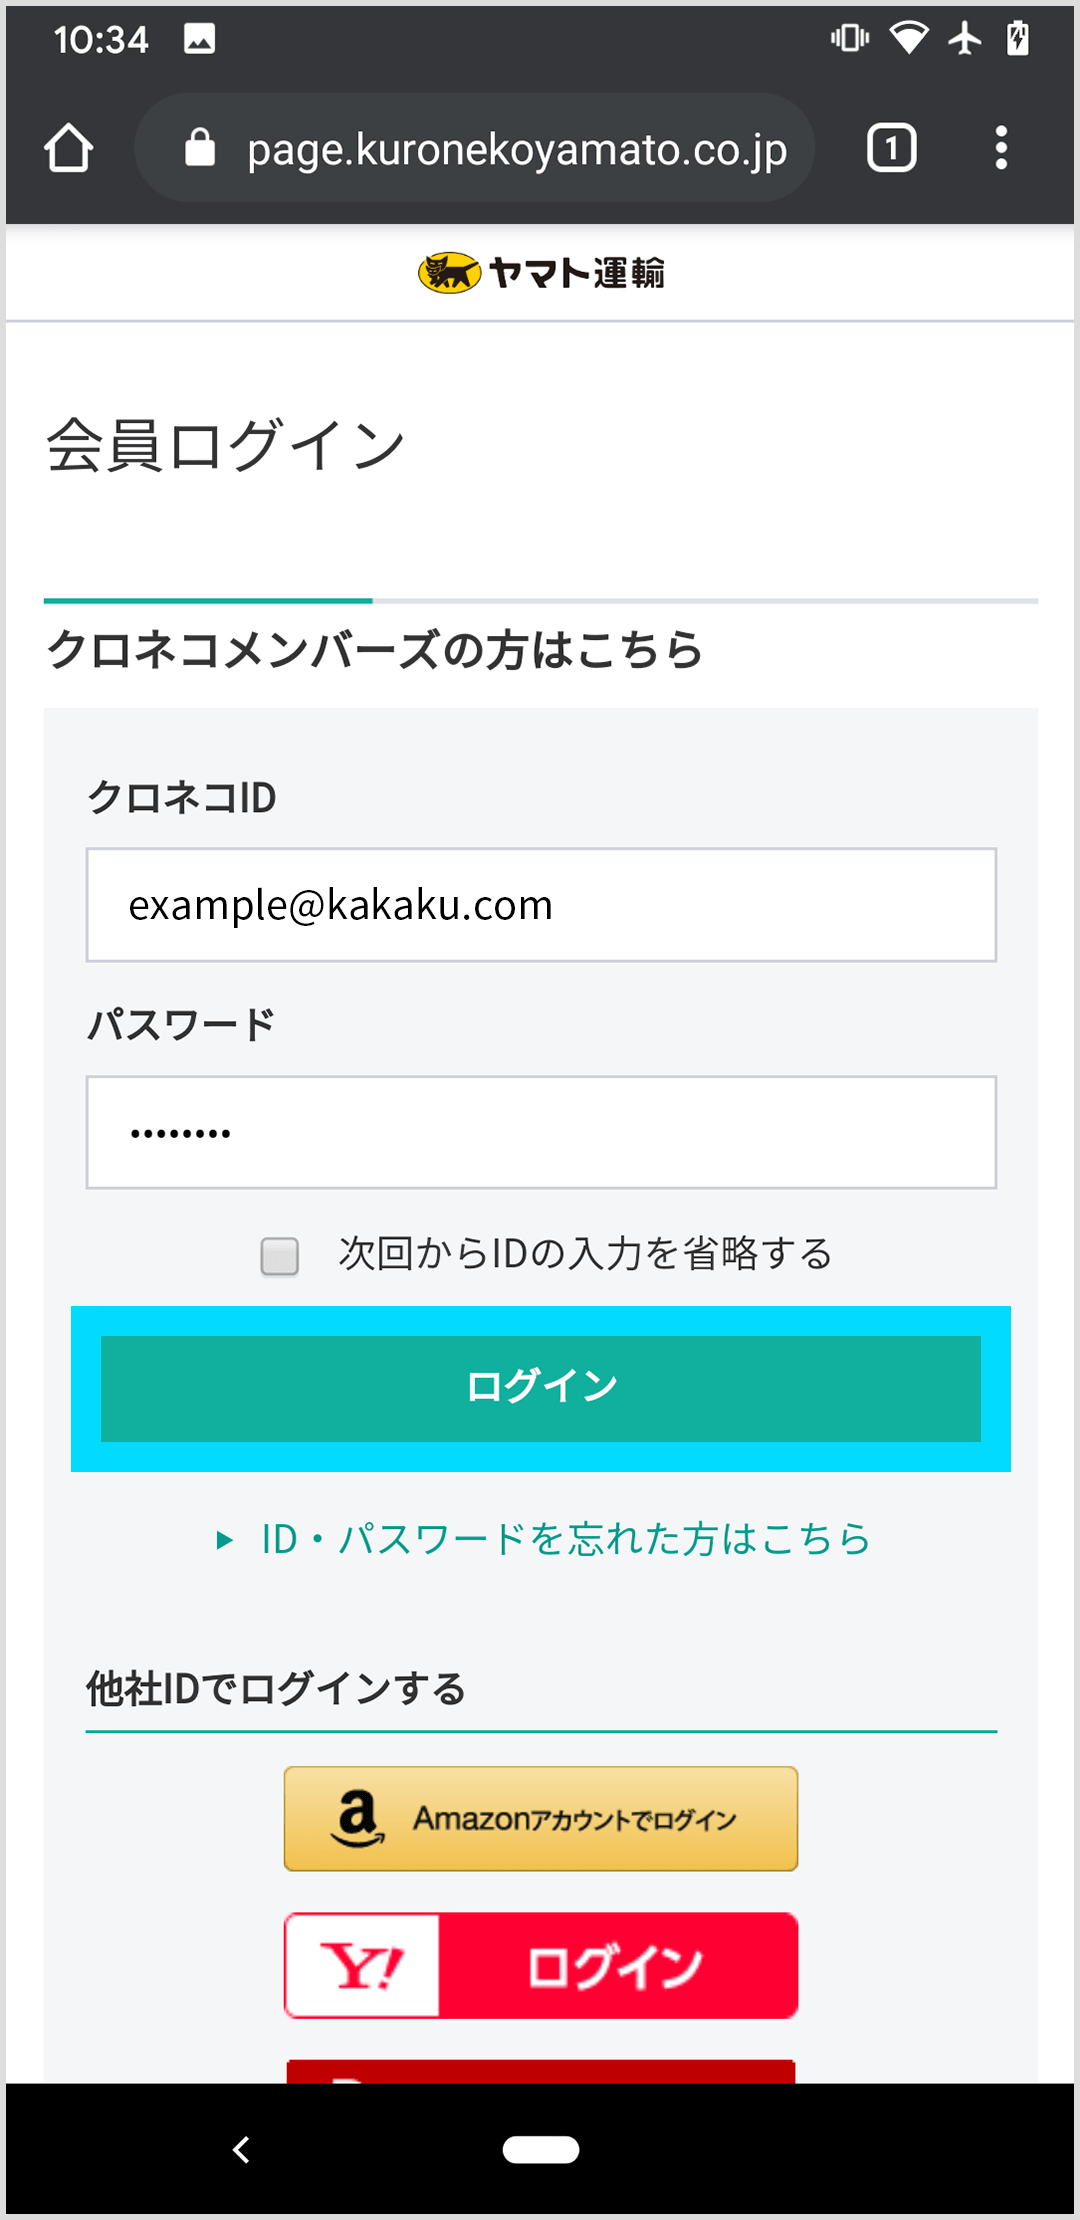 Android - Chromeのホーム画面